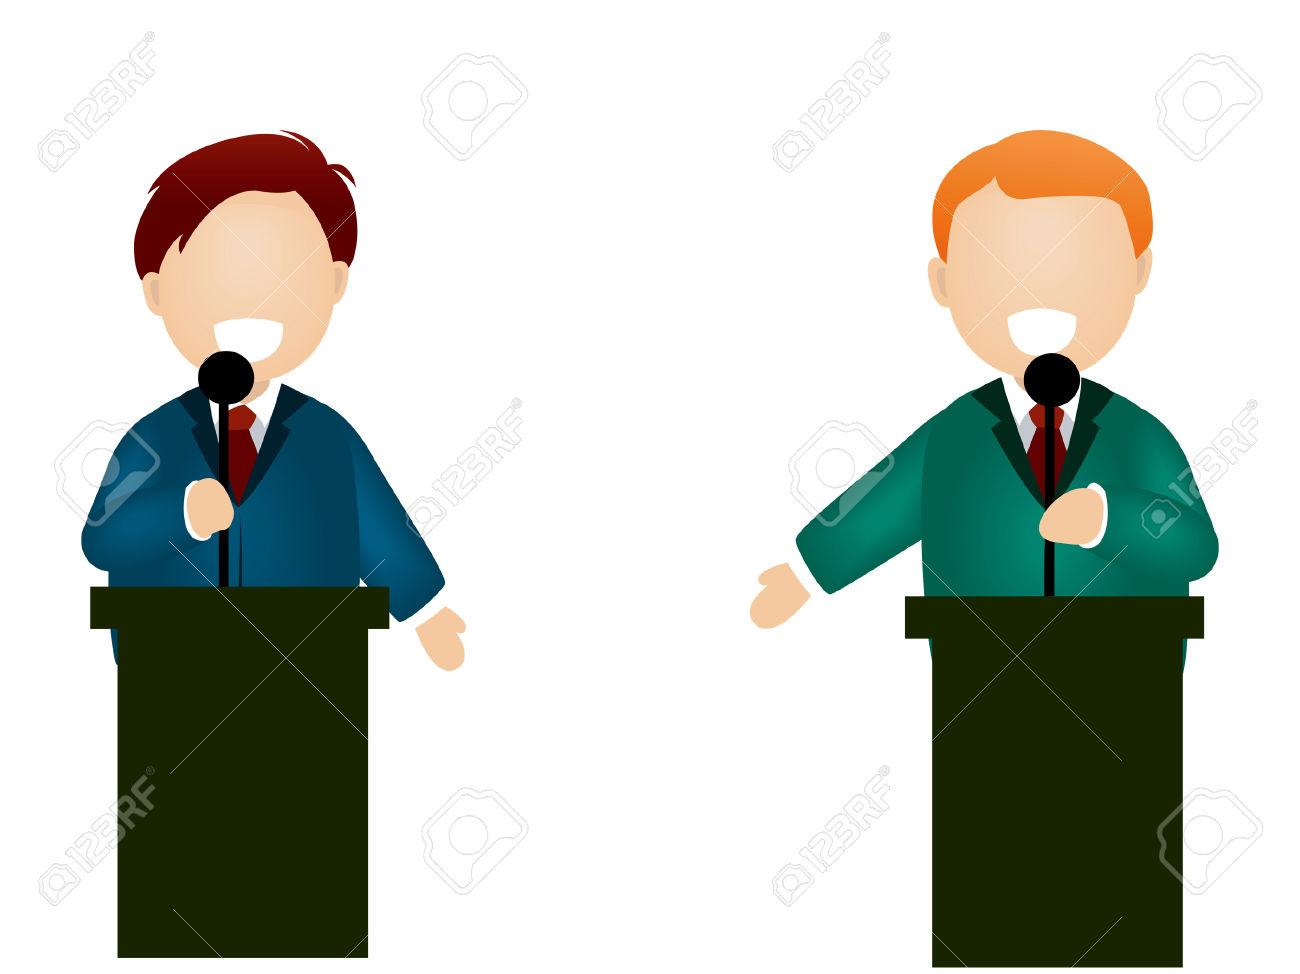 Politics clipart debate. Free download best